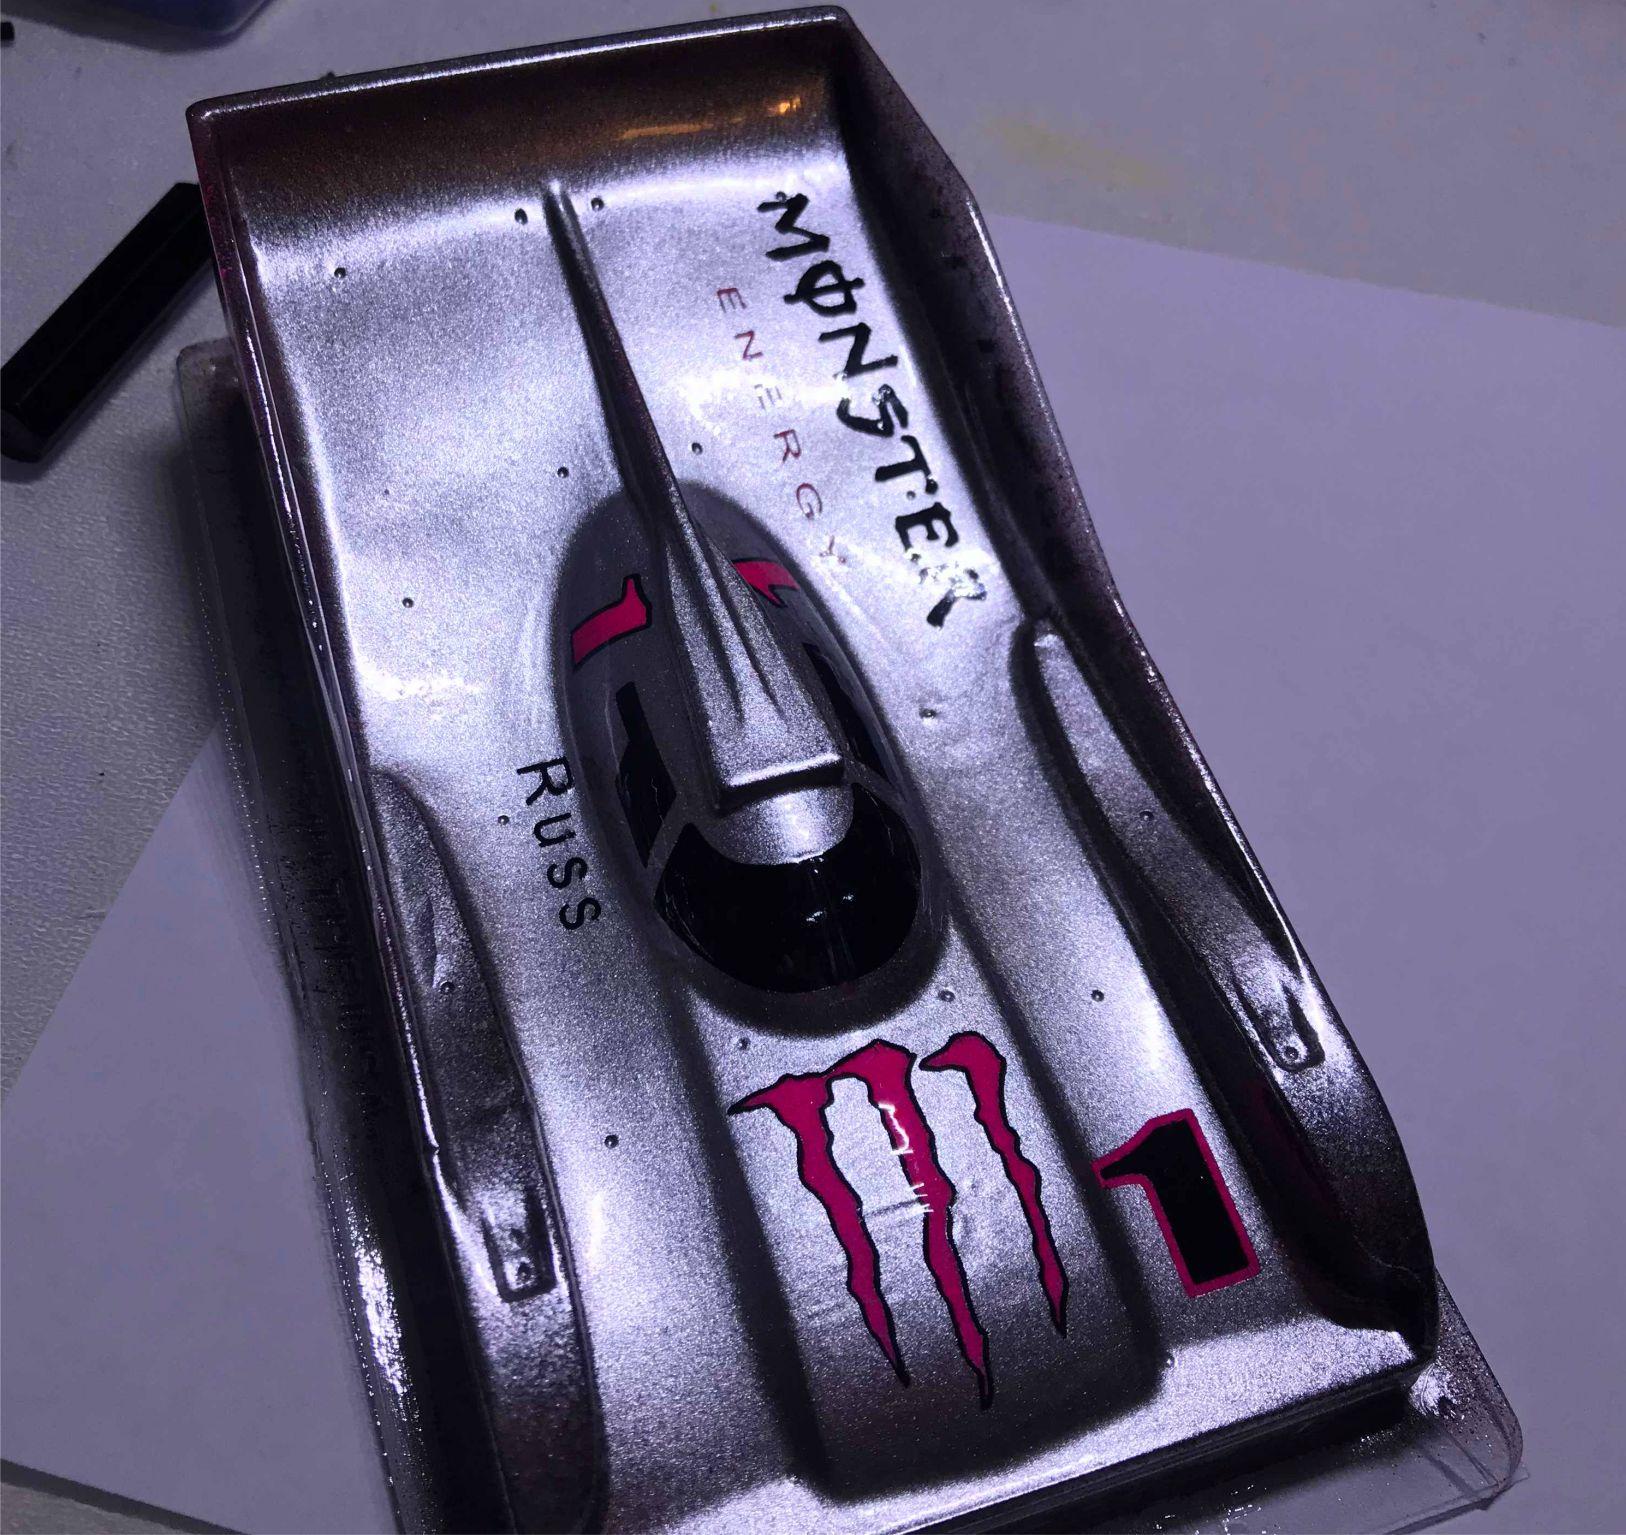 Russ Martin Car 1.15.18.jpg